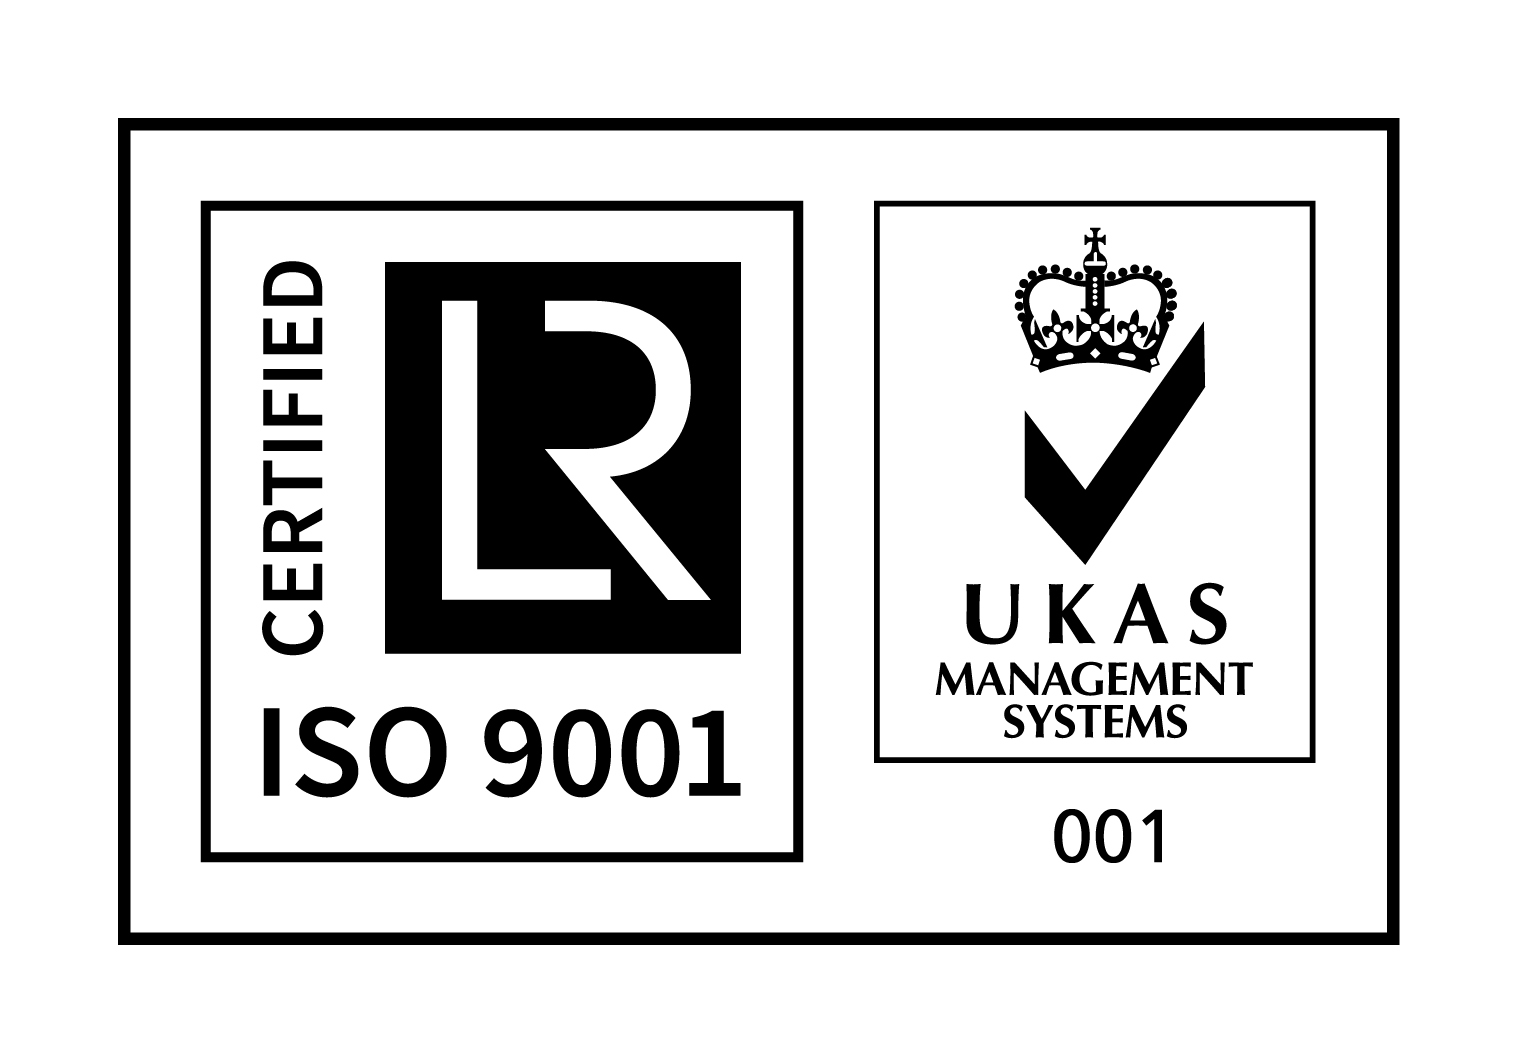 UKAS ISO 9001 | OXIMASA